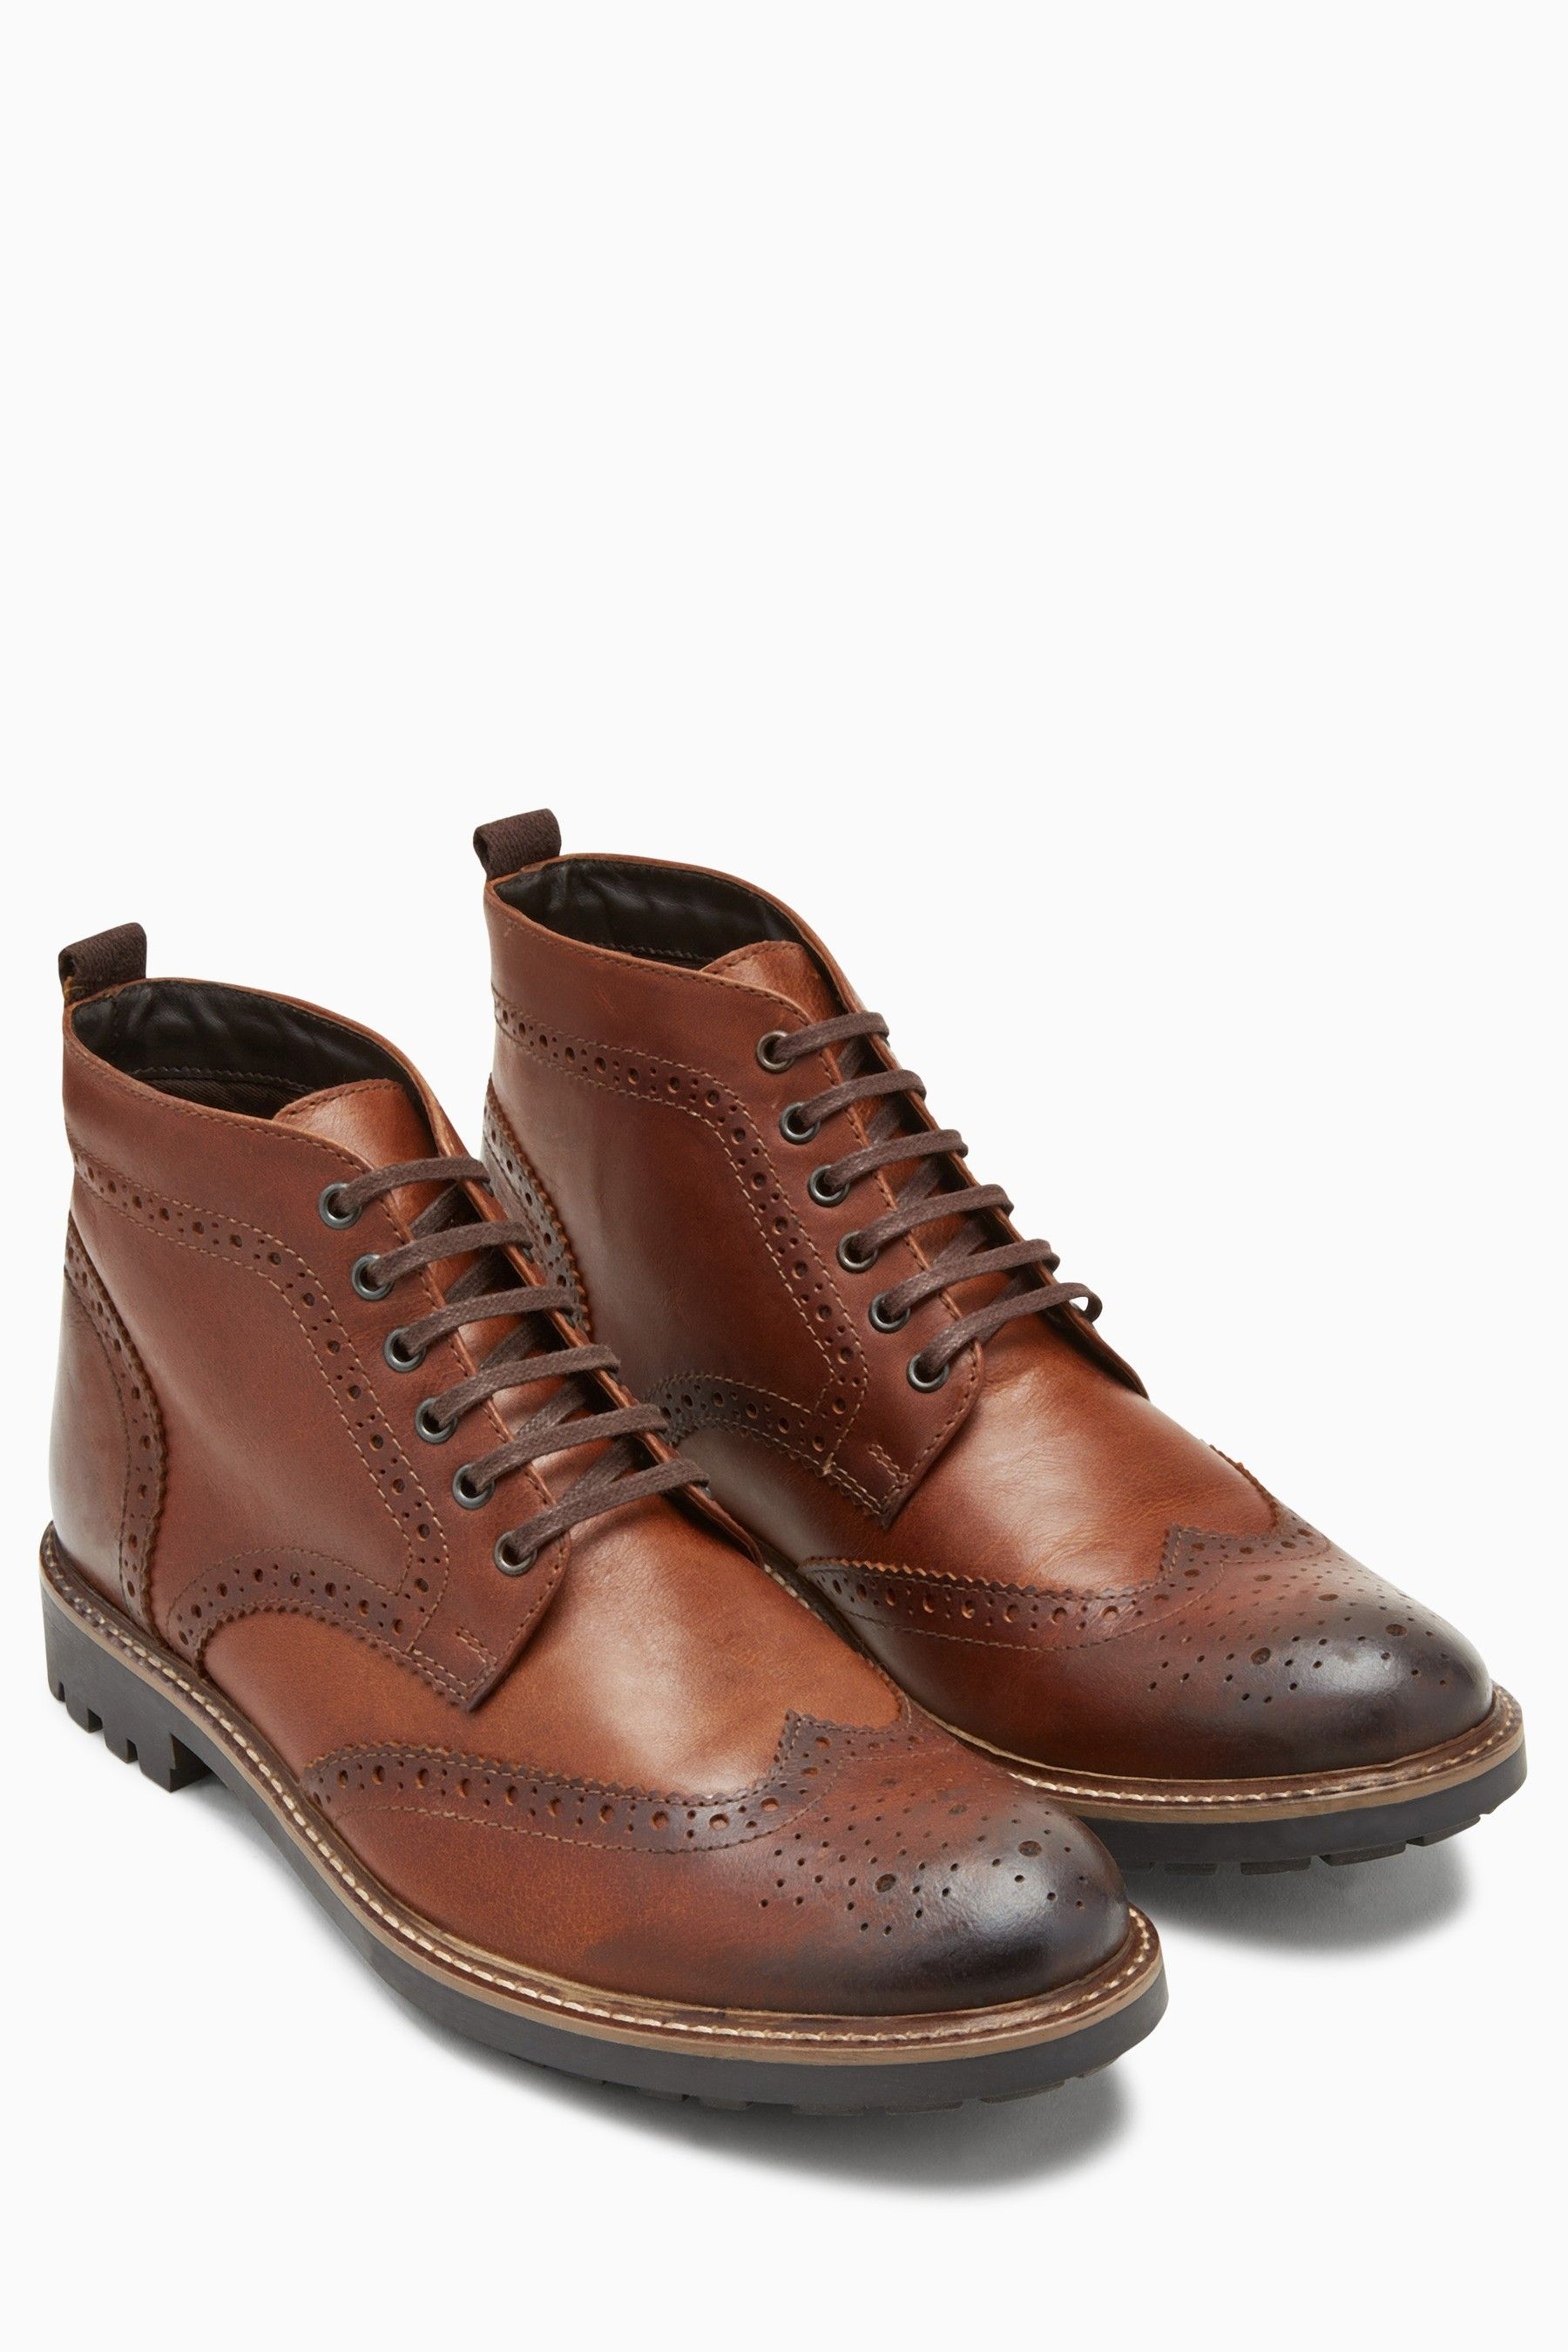 Mens Next Tan Brogue Cleat Boot - Brown